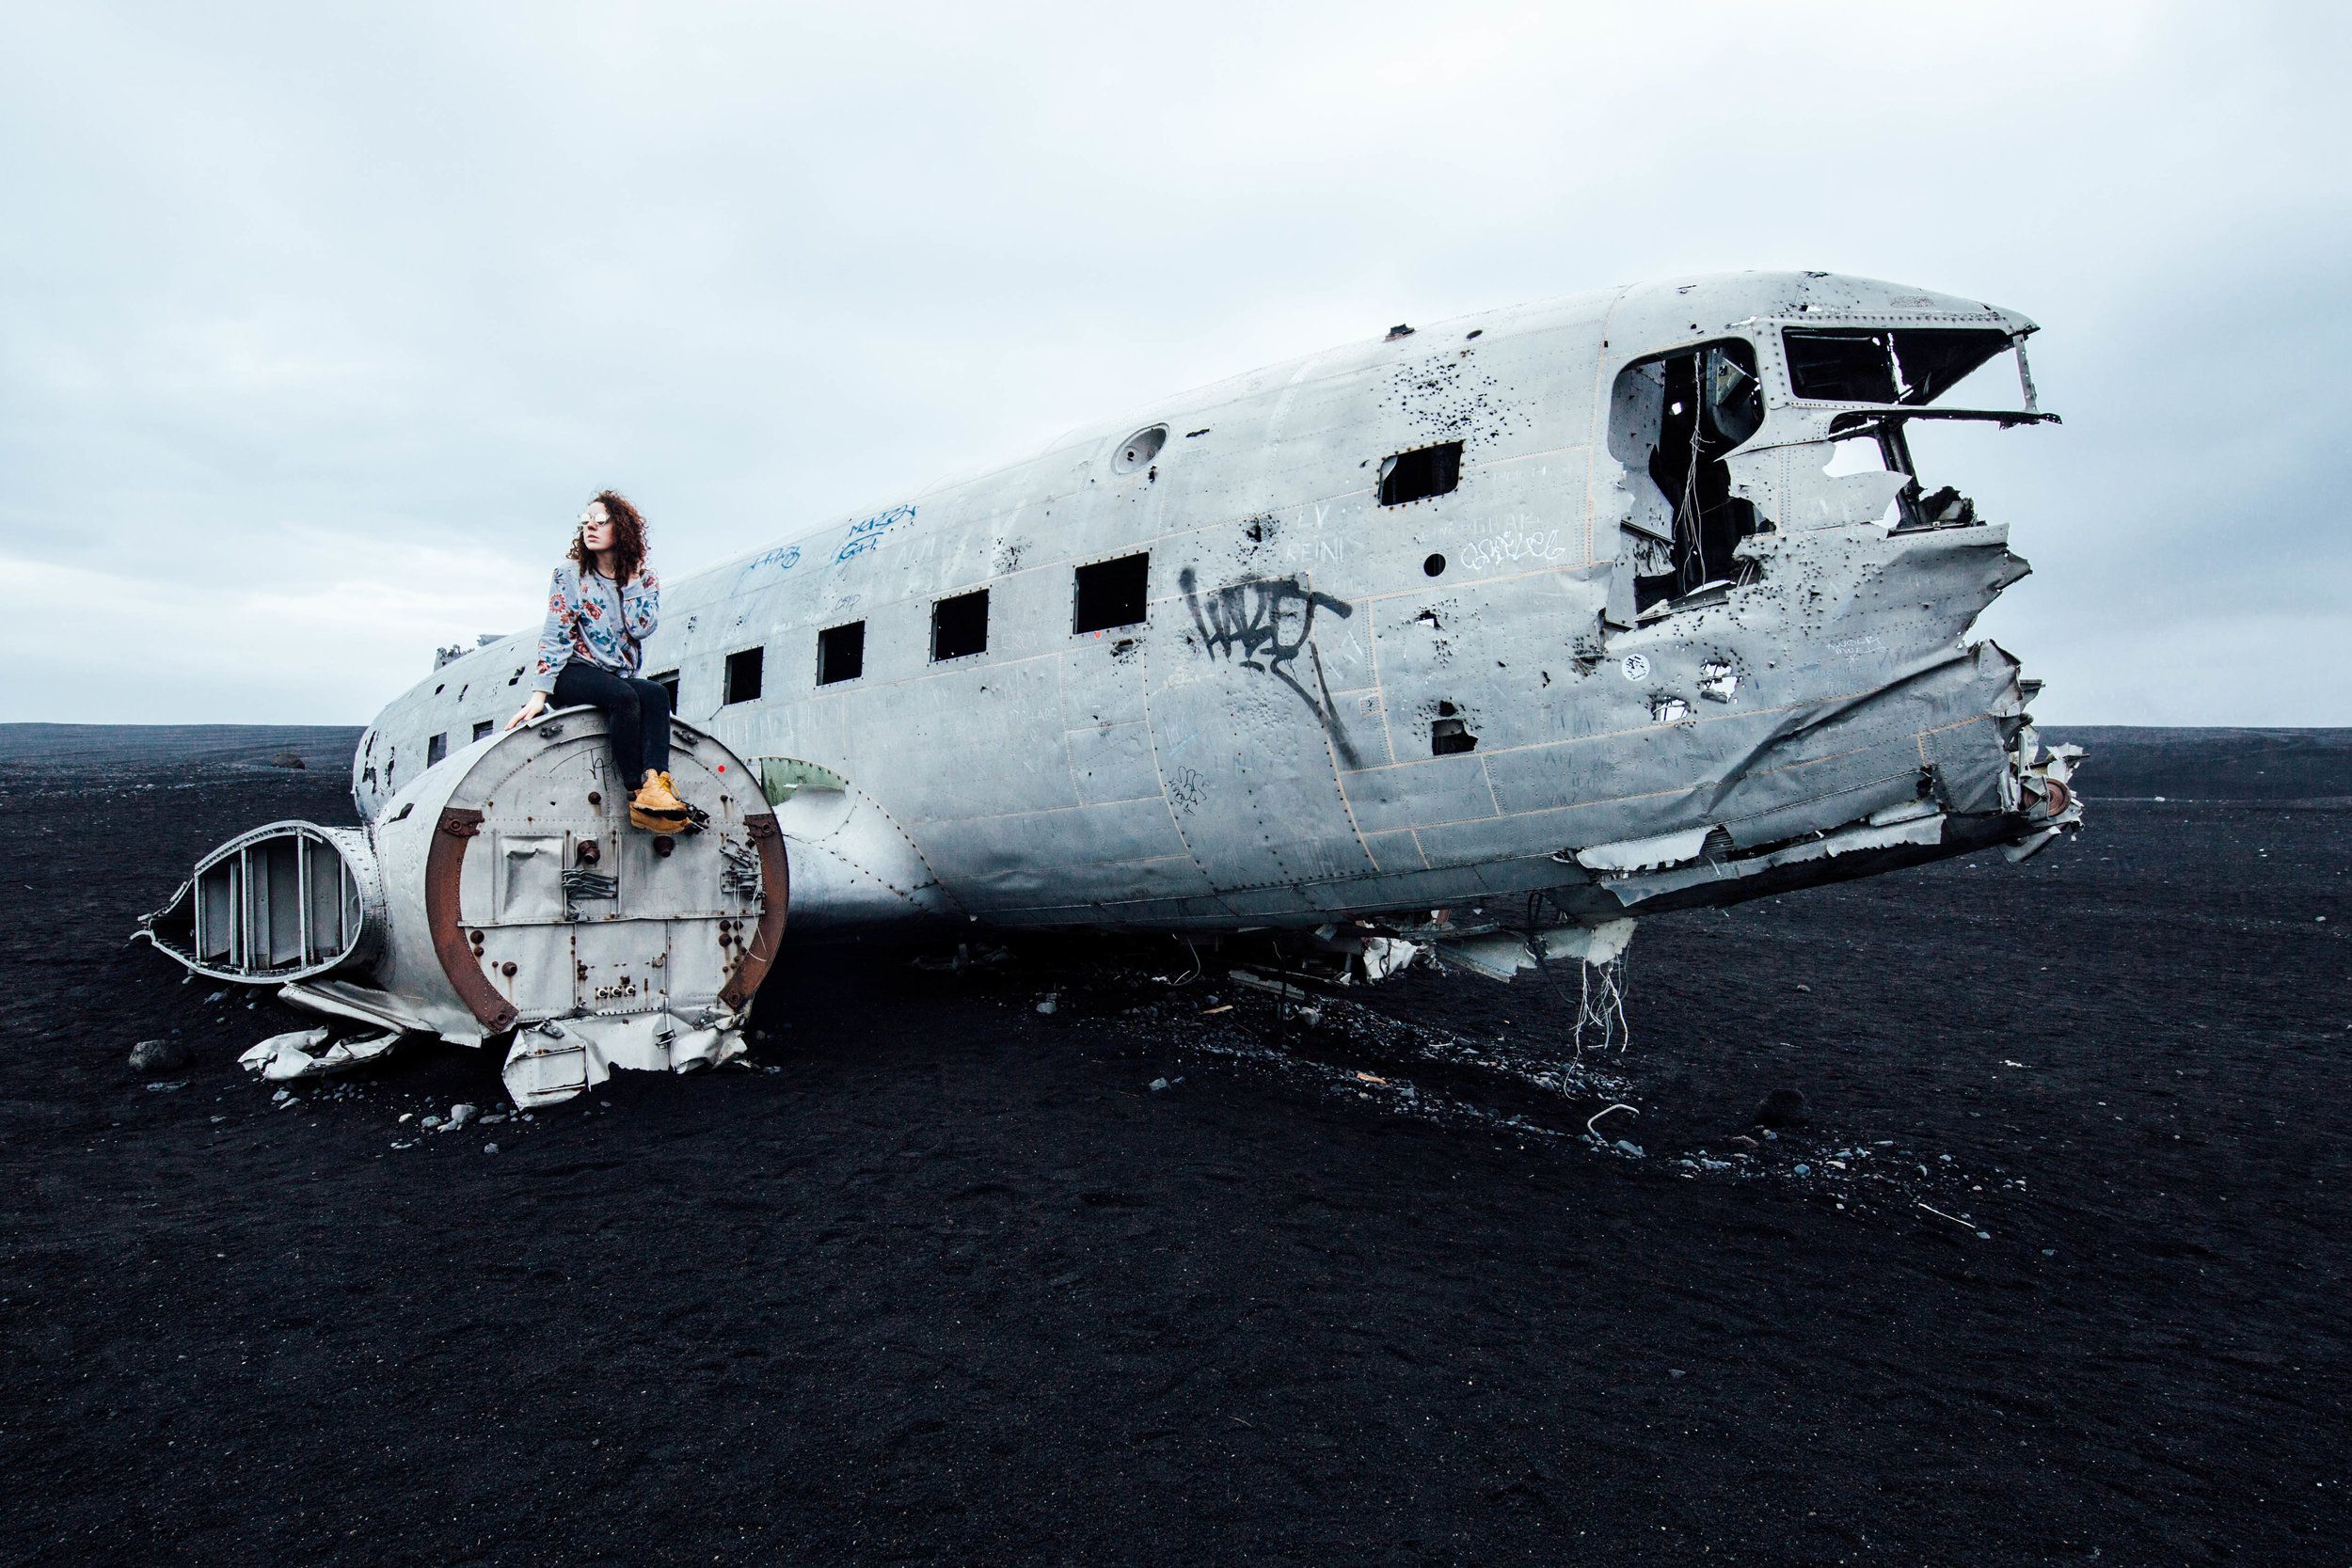 D3 Plane Crash